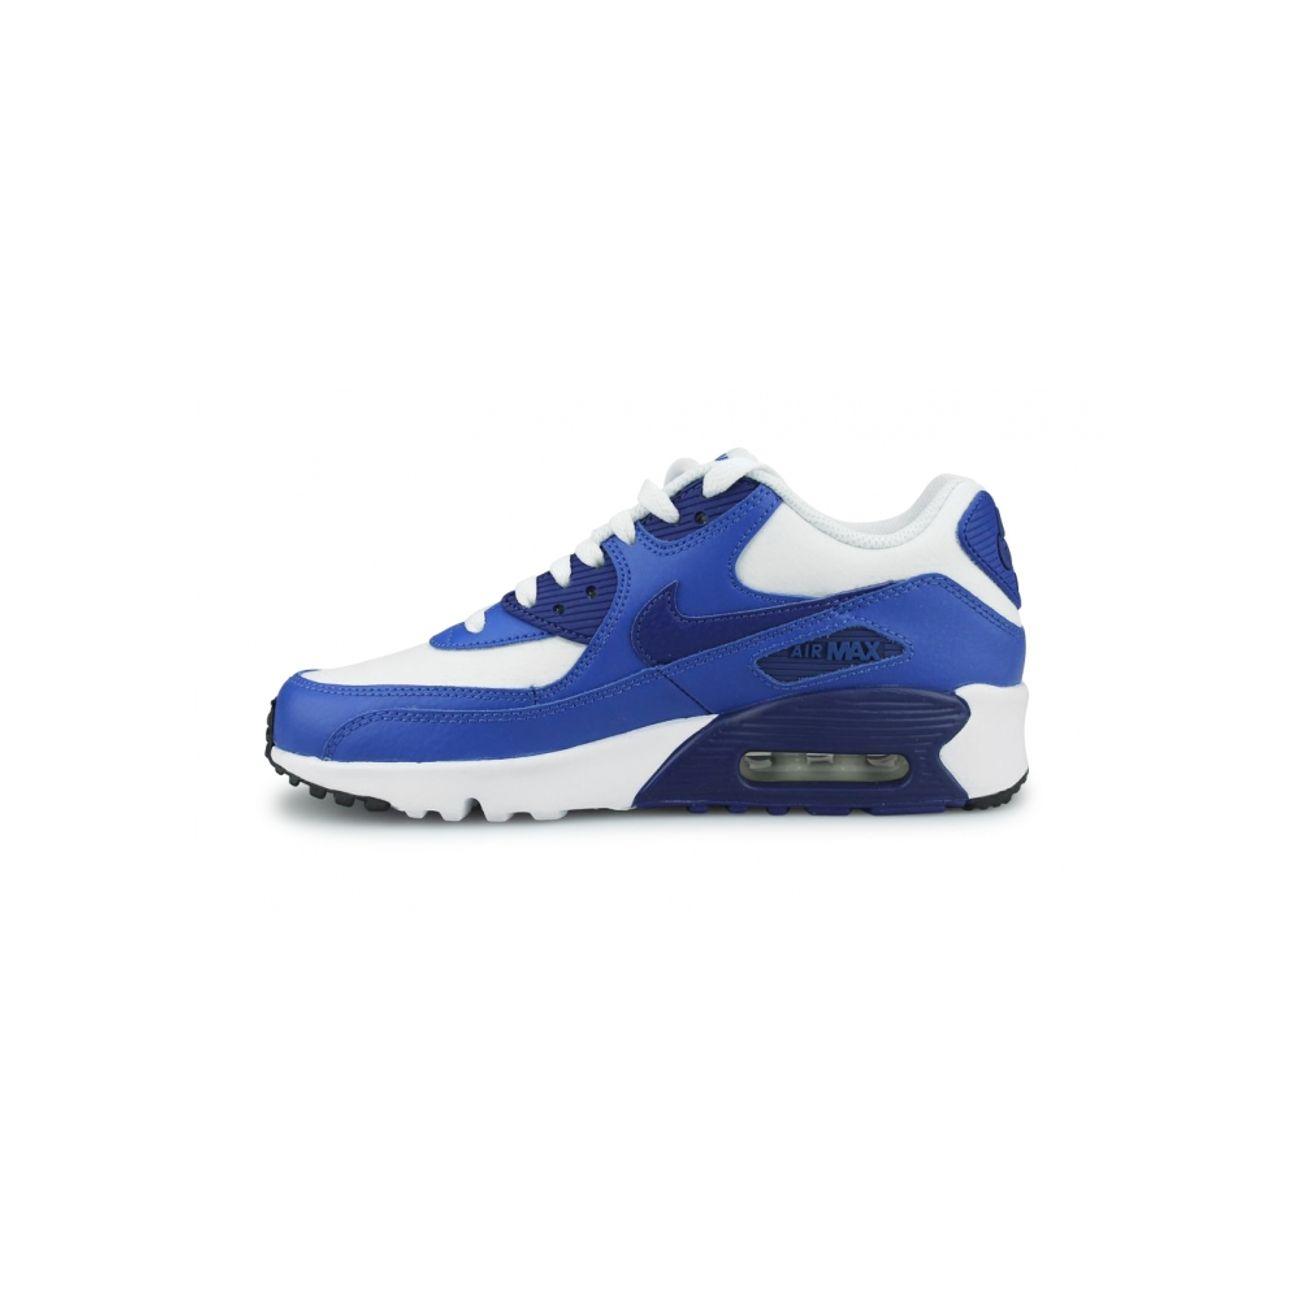 online store 59633 f9dcf ... Mode- Lifestyle garçon NIKE Basket Nike Air Max 90 Ltr Junior Blanc  833412-105 ...